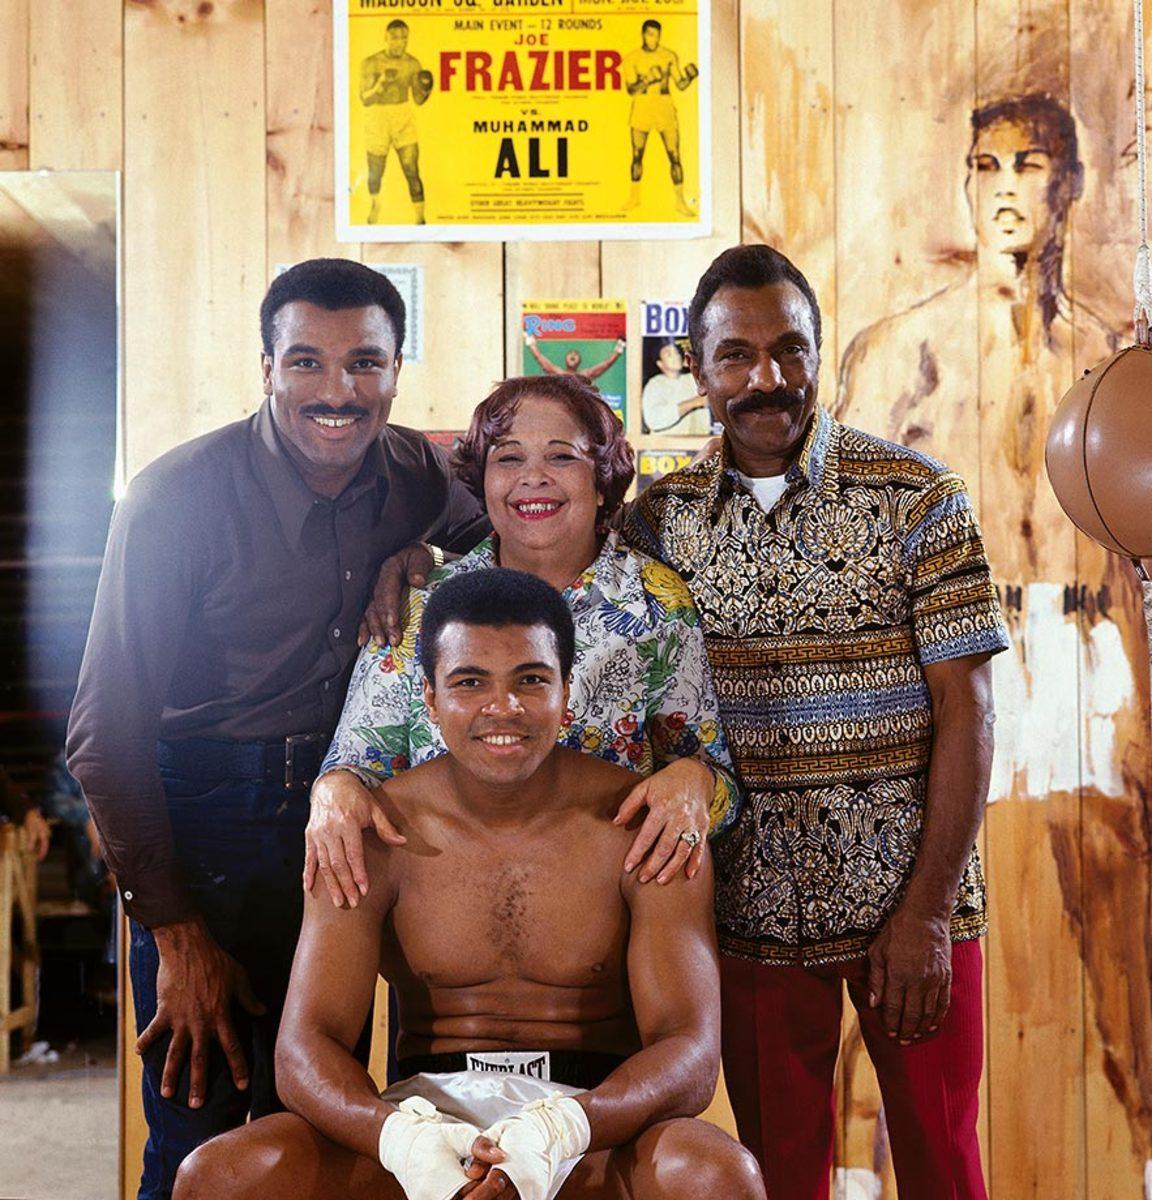 1974-Muhammad-Ali-brother-Rahman-mother-Pdessa-father-Cassius-014473364.jpg